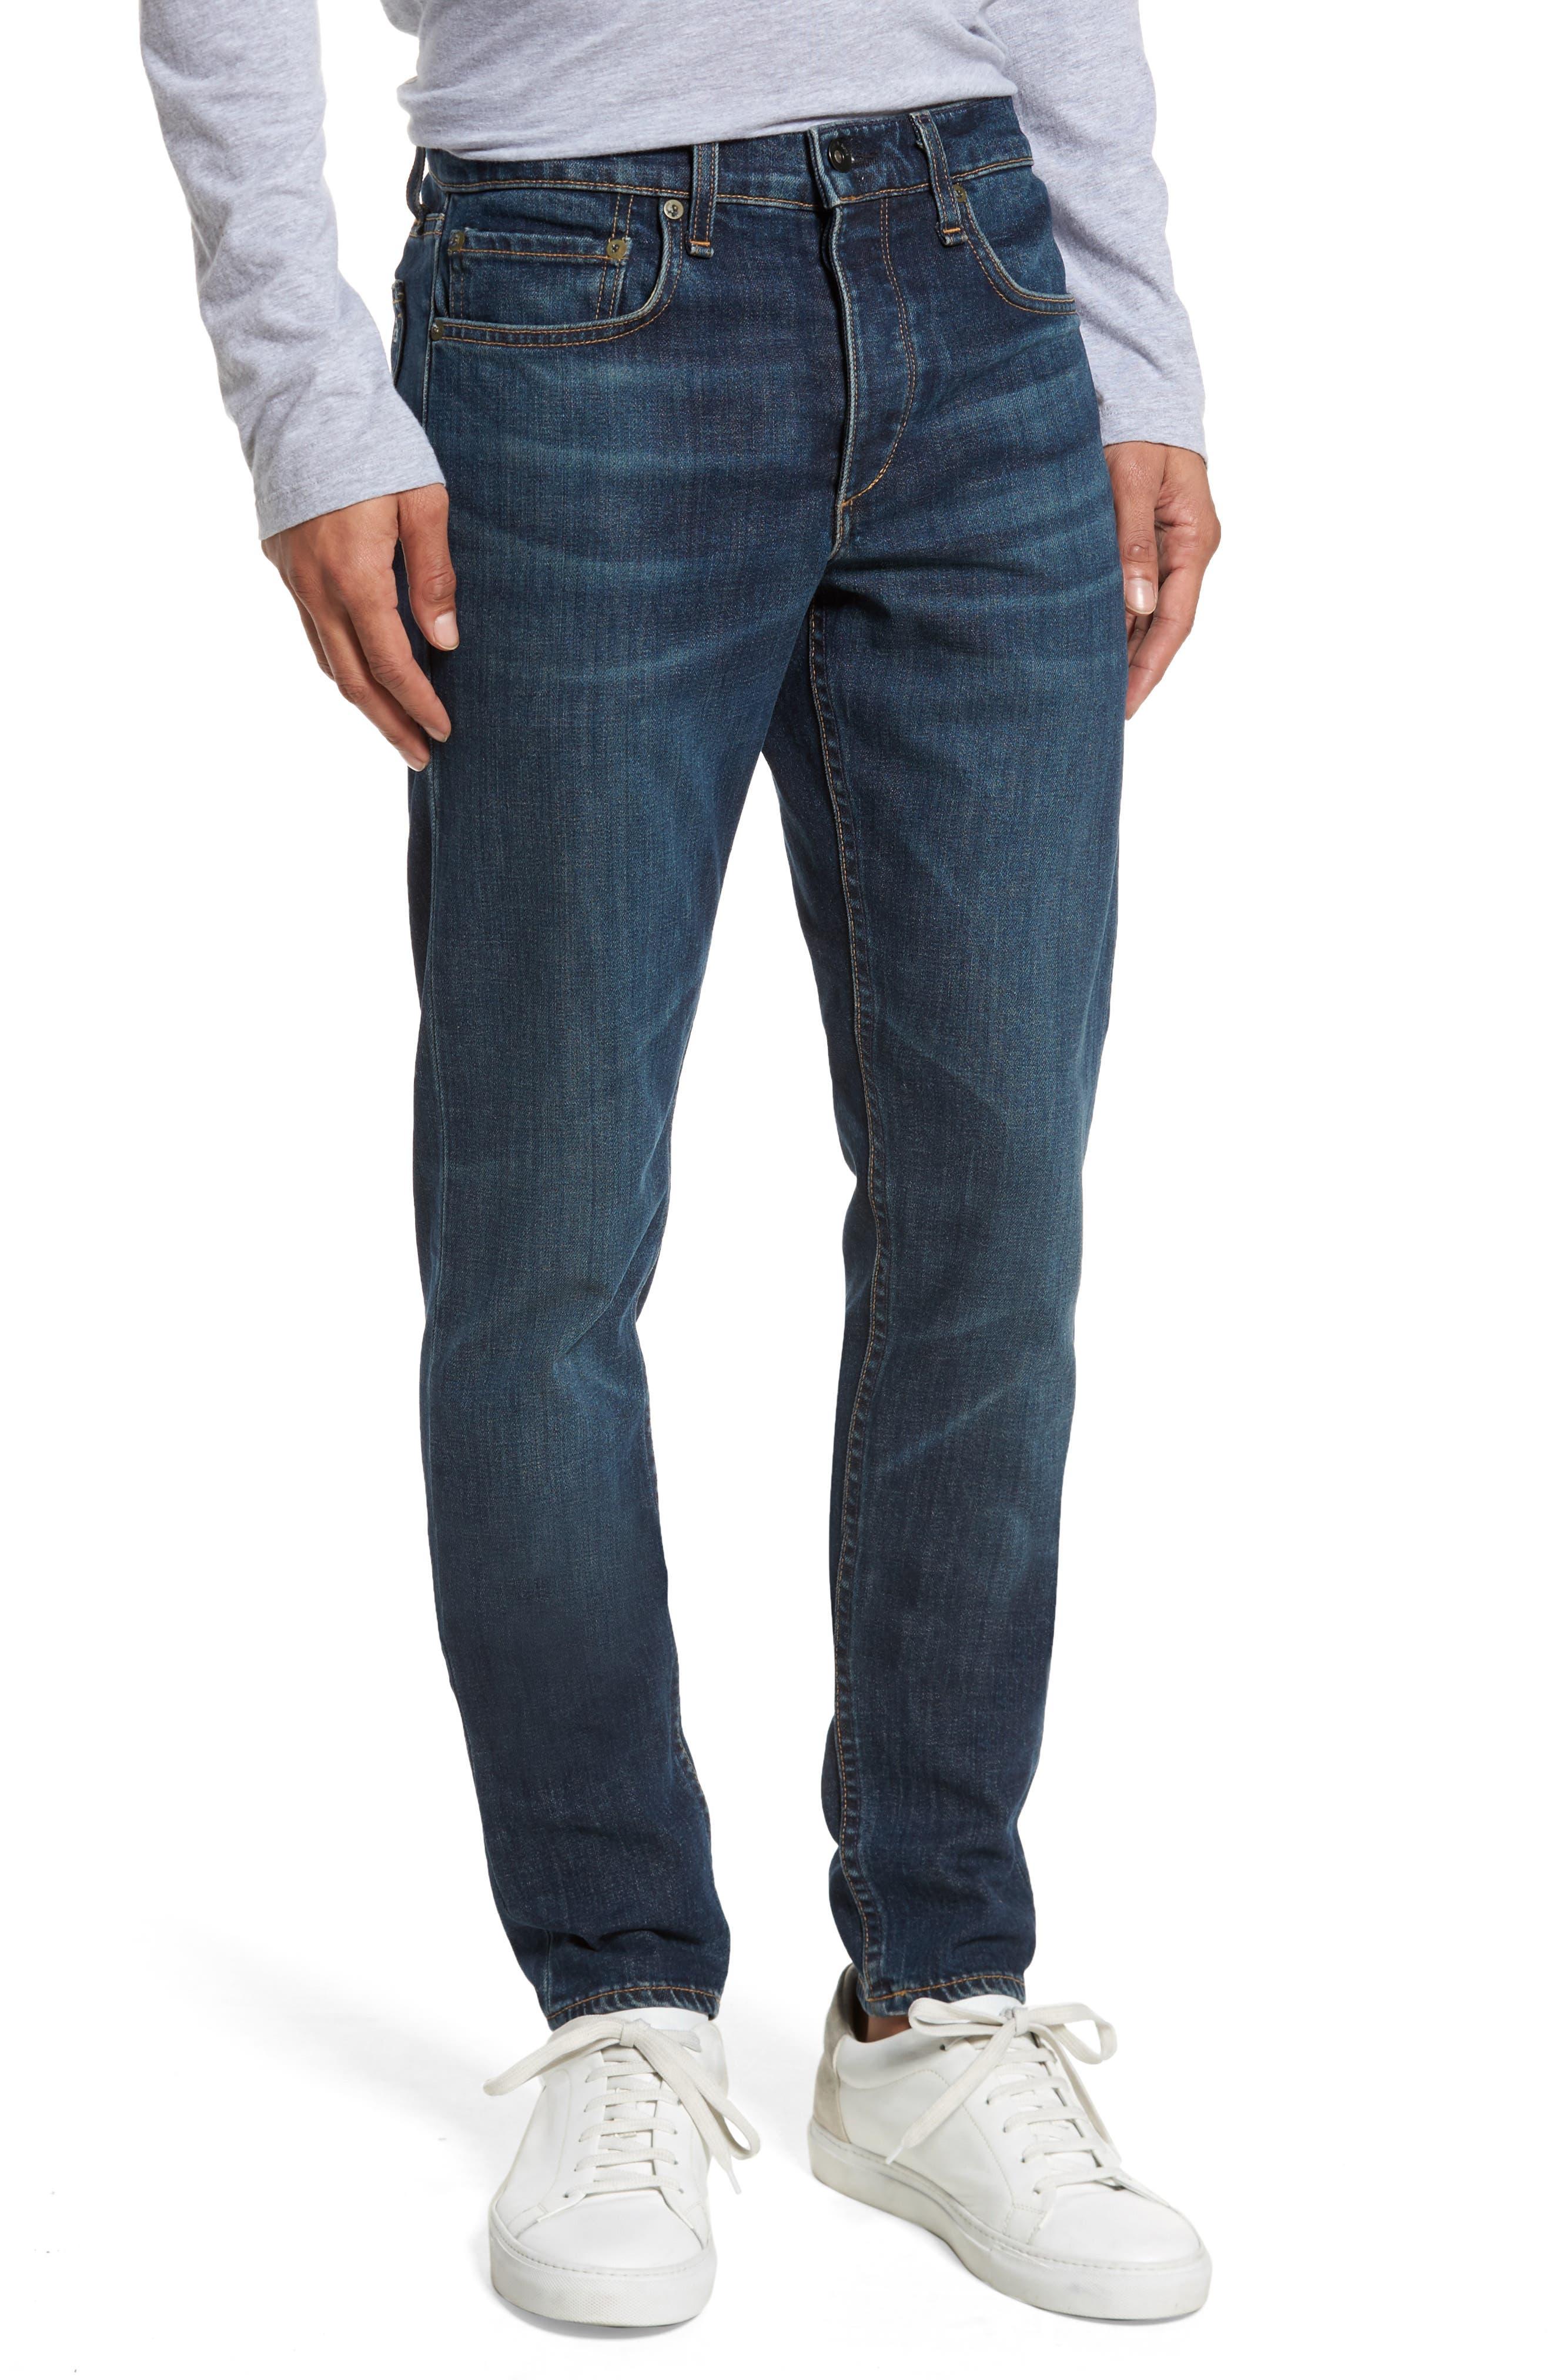 RAG & BONE Fit 1 Skinny Fit Jeans, Main, color, 420